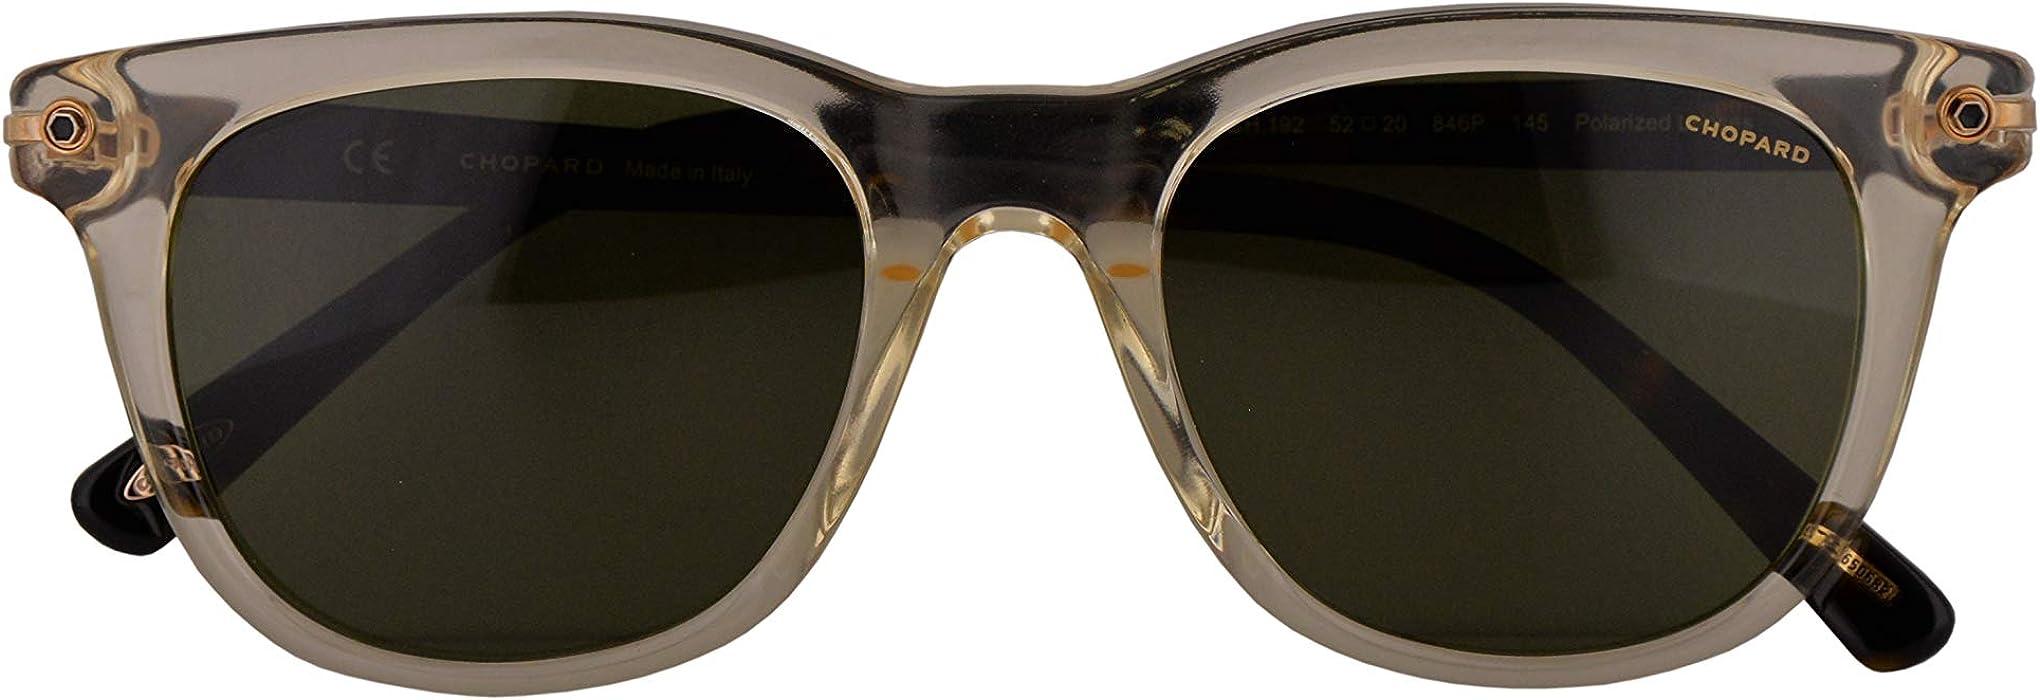 a4c14e1a4e SCH192 Sunglasses Crystal Yellow w Polarized Green Lens 52mm 846P SCH 192